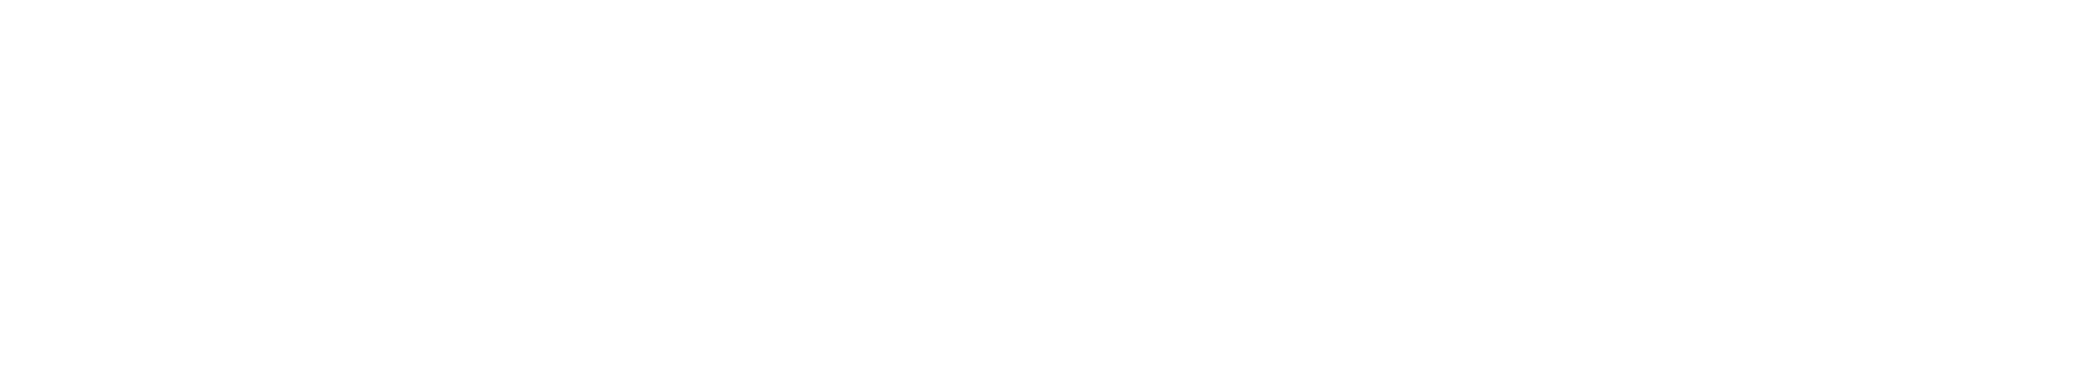 sony led tv logo. sony led tv logo )